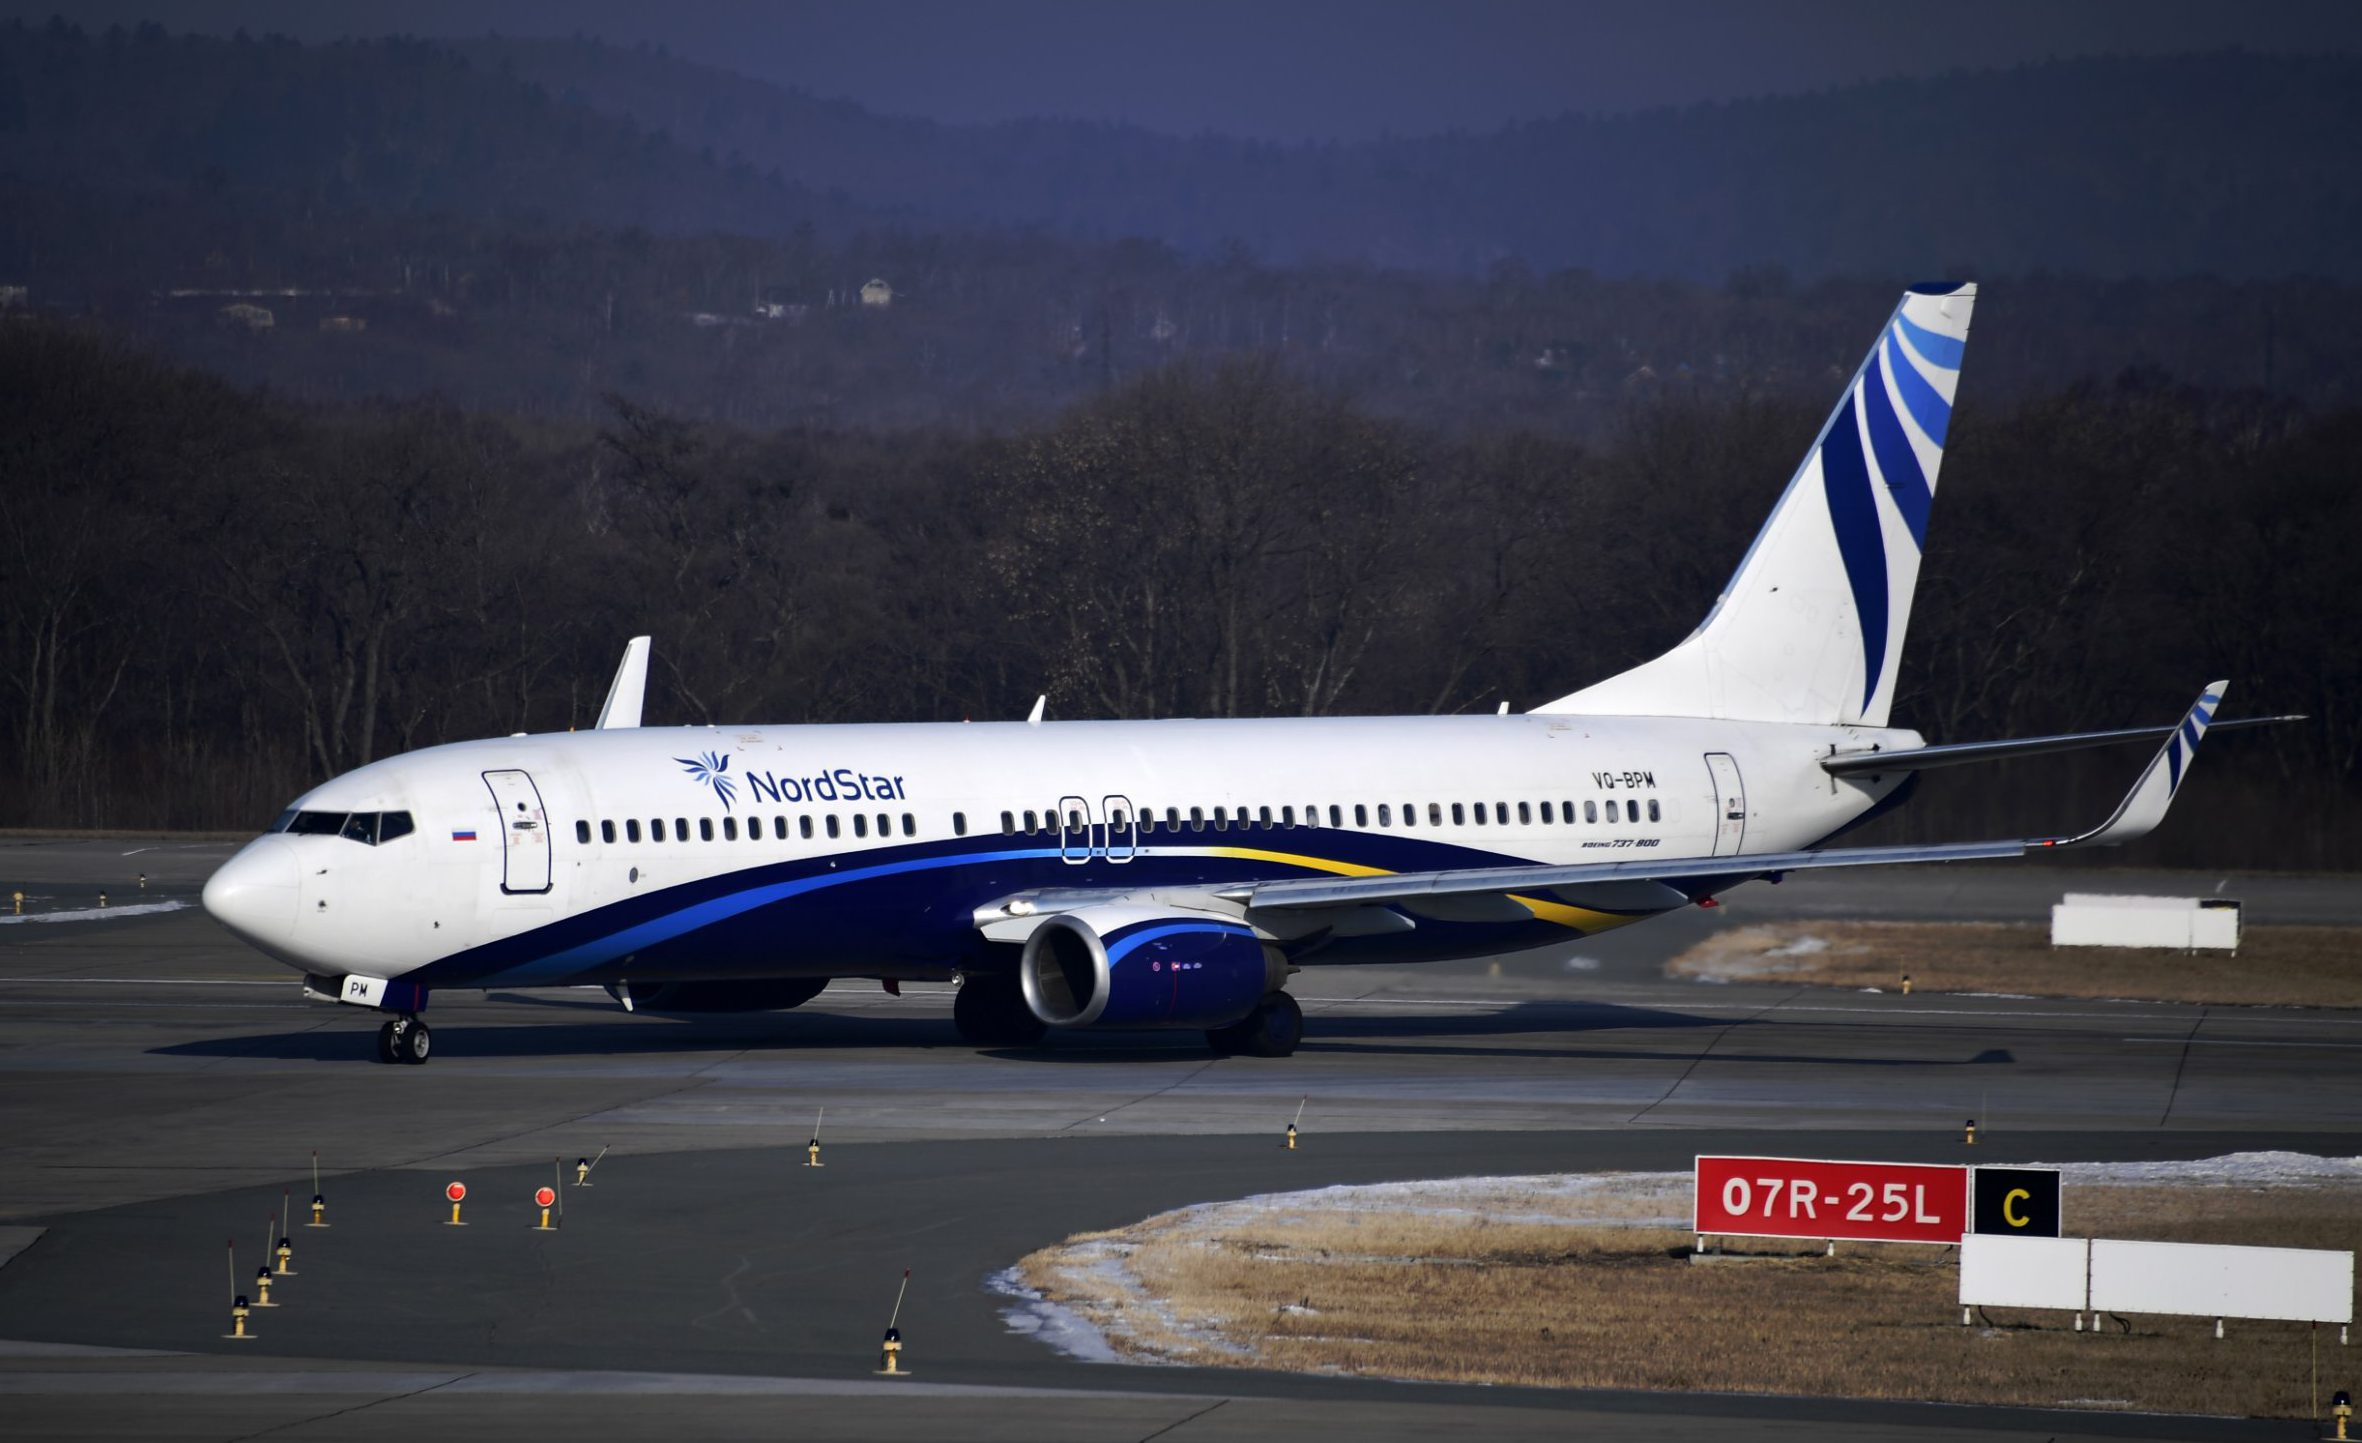 VLADIVOSTOK, RUSSIA ? FEBRUARY 9, 2018: Boeing 737-800 of the NordStar airline at the Vladivostok International Airport. Yuri Smityuk/TASS